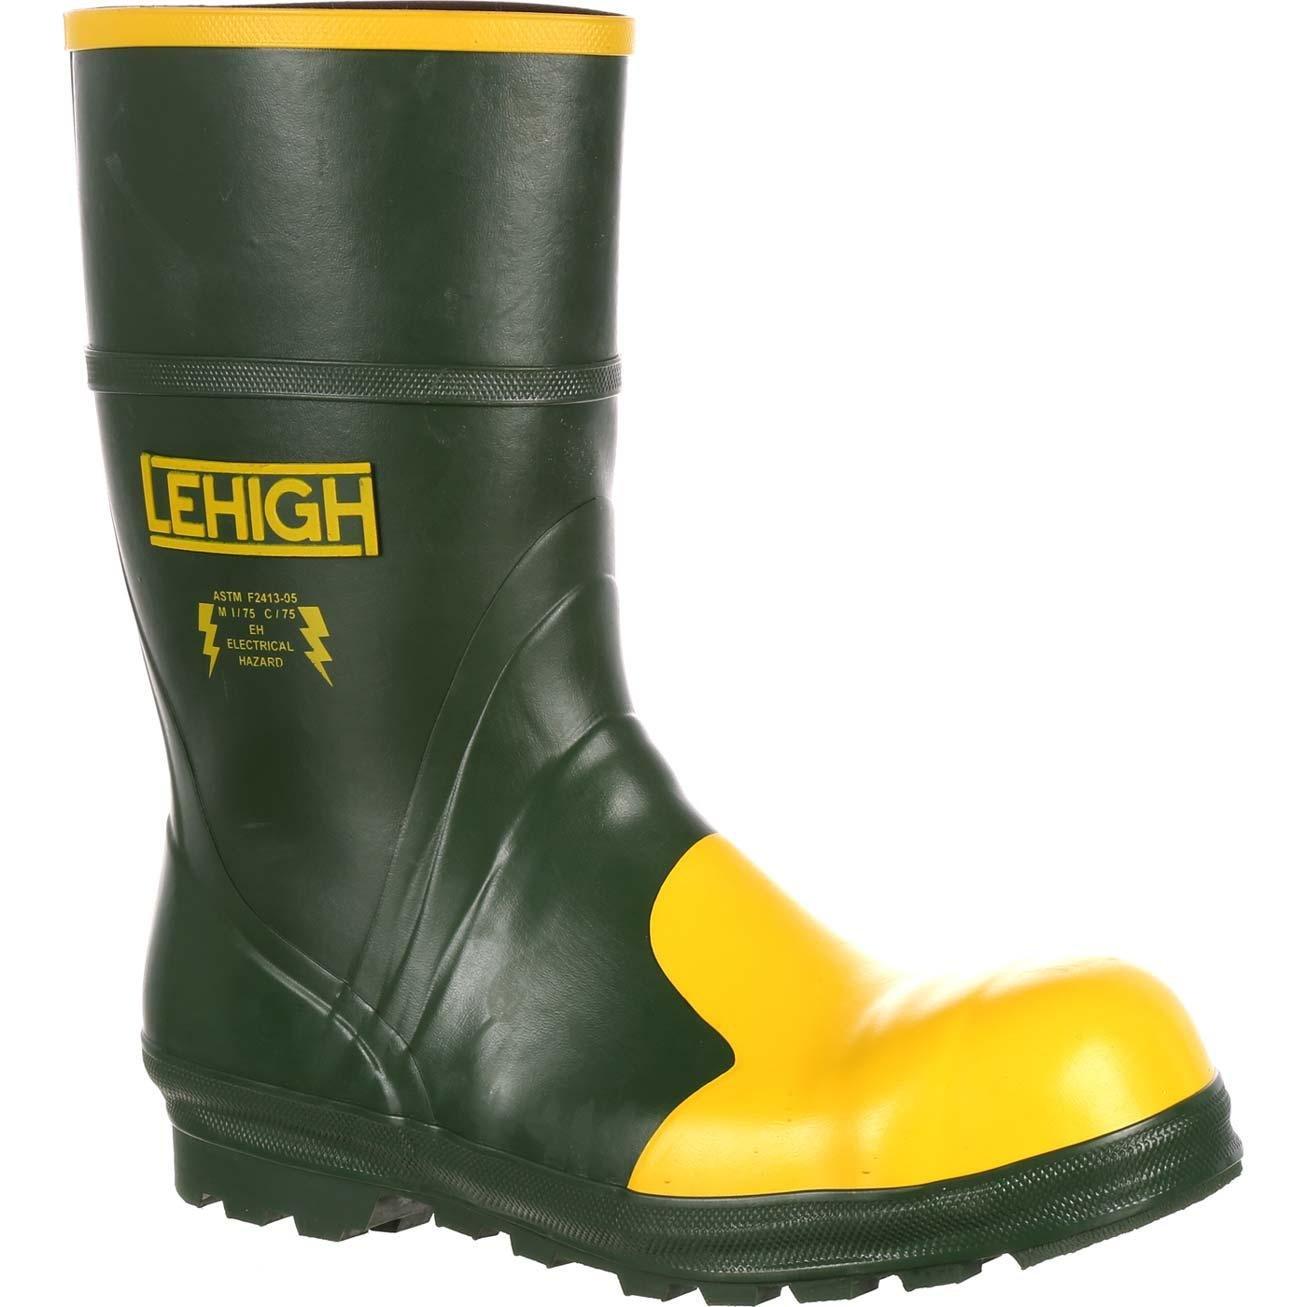 Lehigh Safety Shoes Unisex Steel Toe Rubber Hydroshock Waterproof Dielectric Work Boot Green